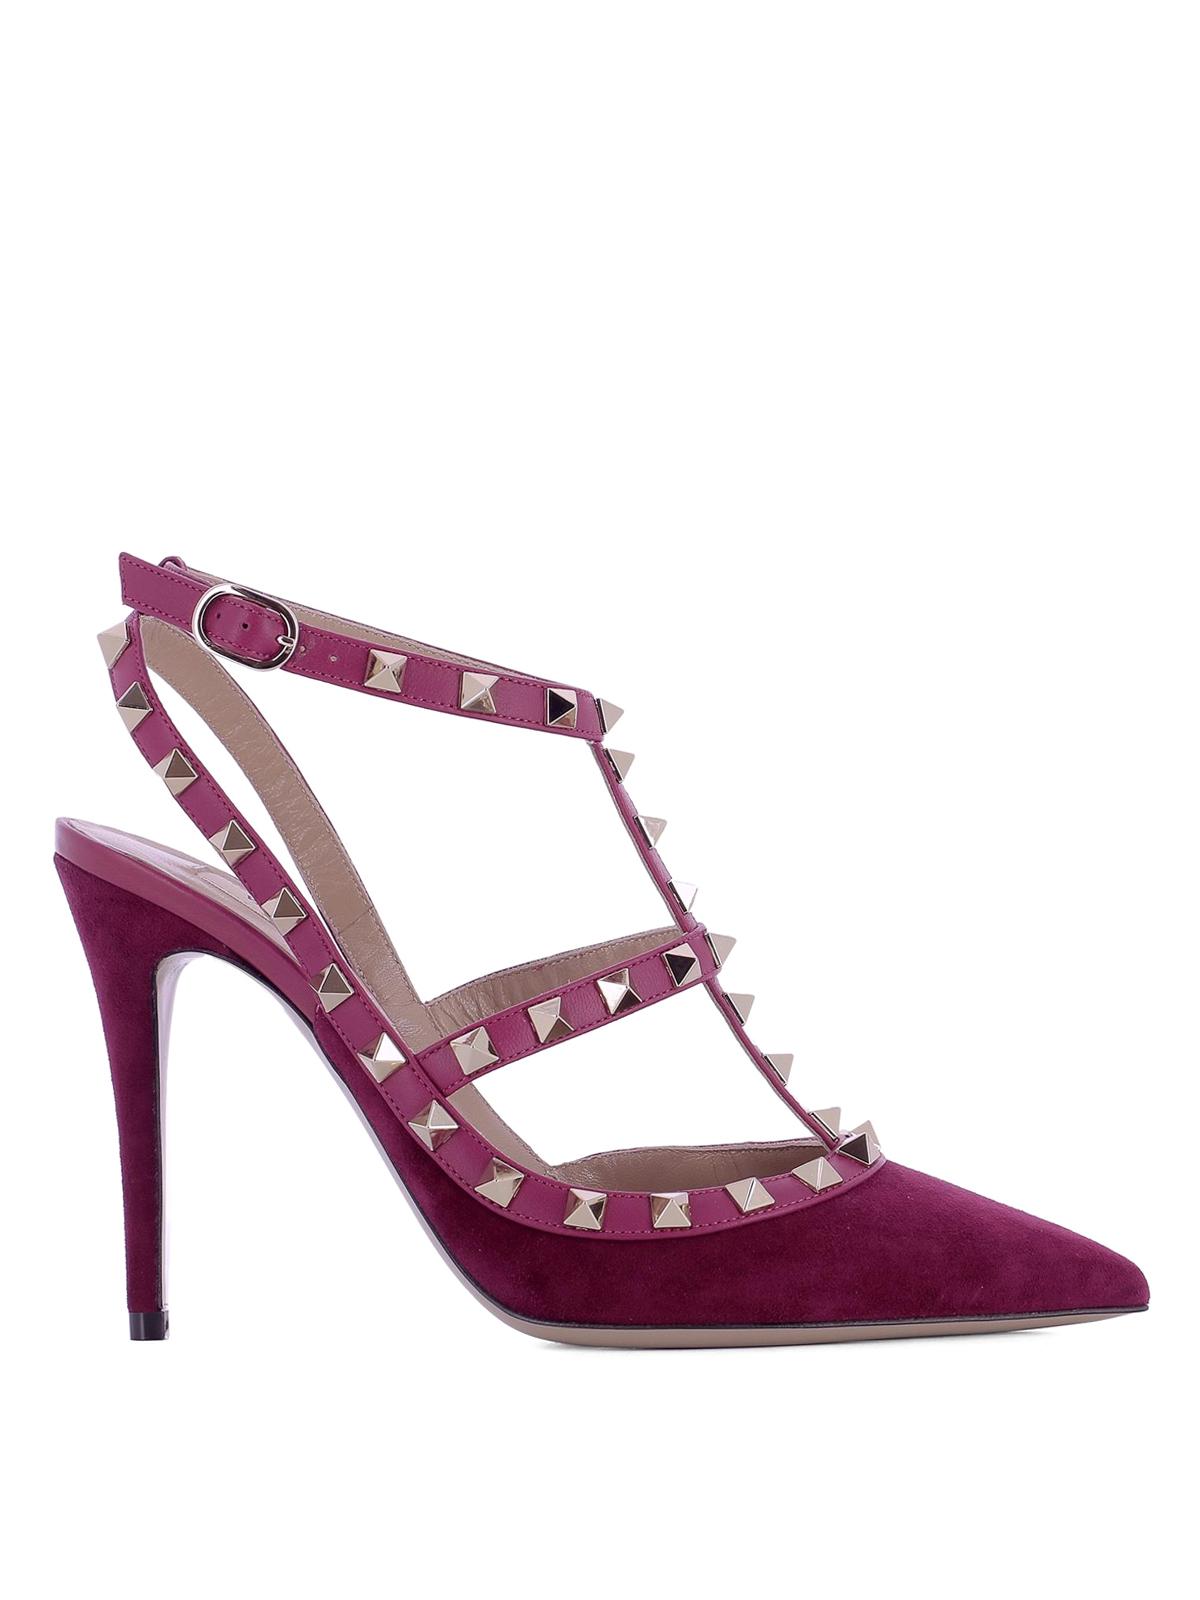 rockstud purple suede pumps by valentino garavani court shoes ikrix. Black Bedroom Furniture Sets. Home Design Ideas